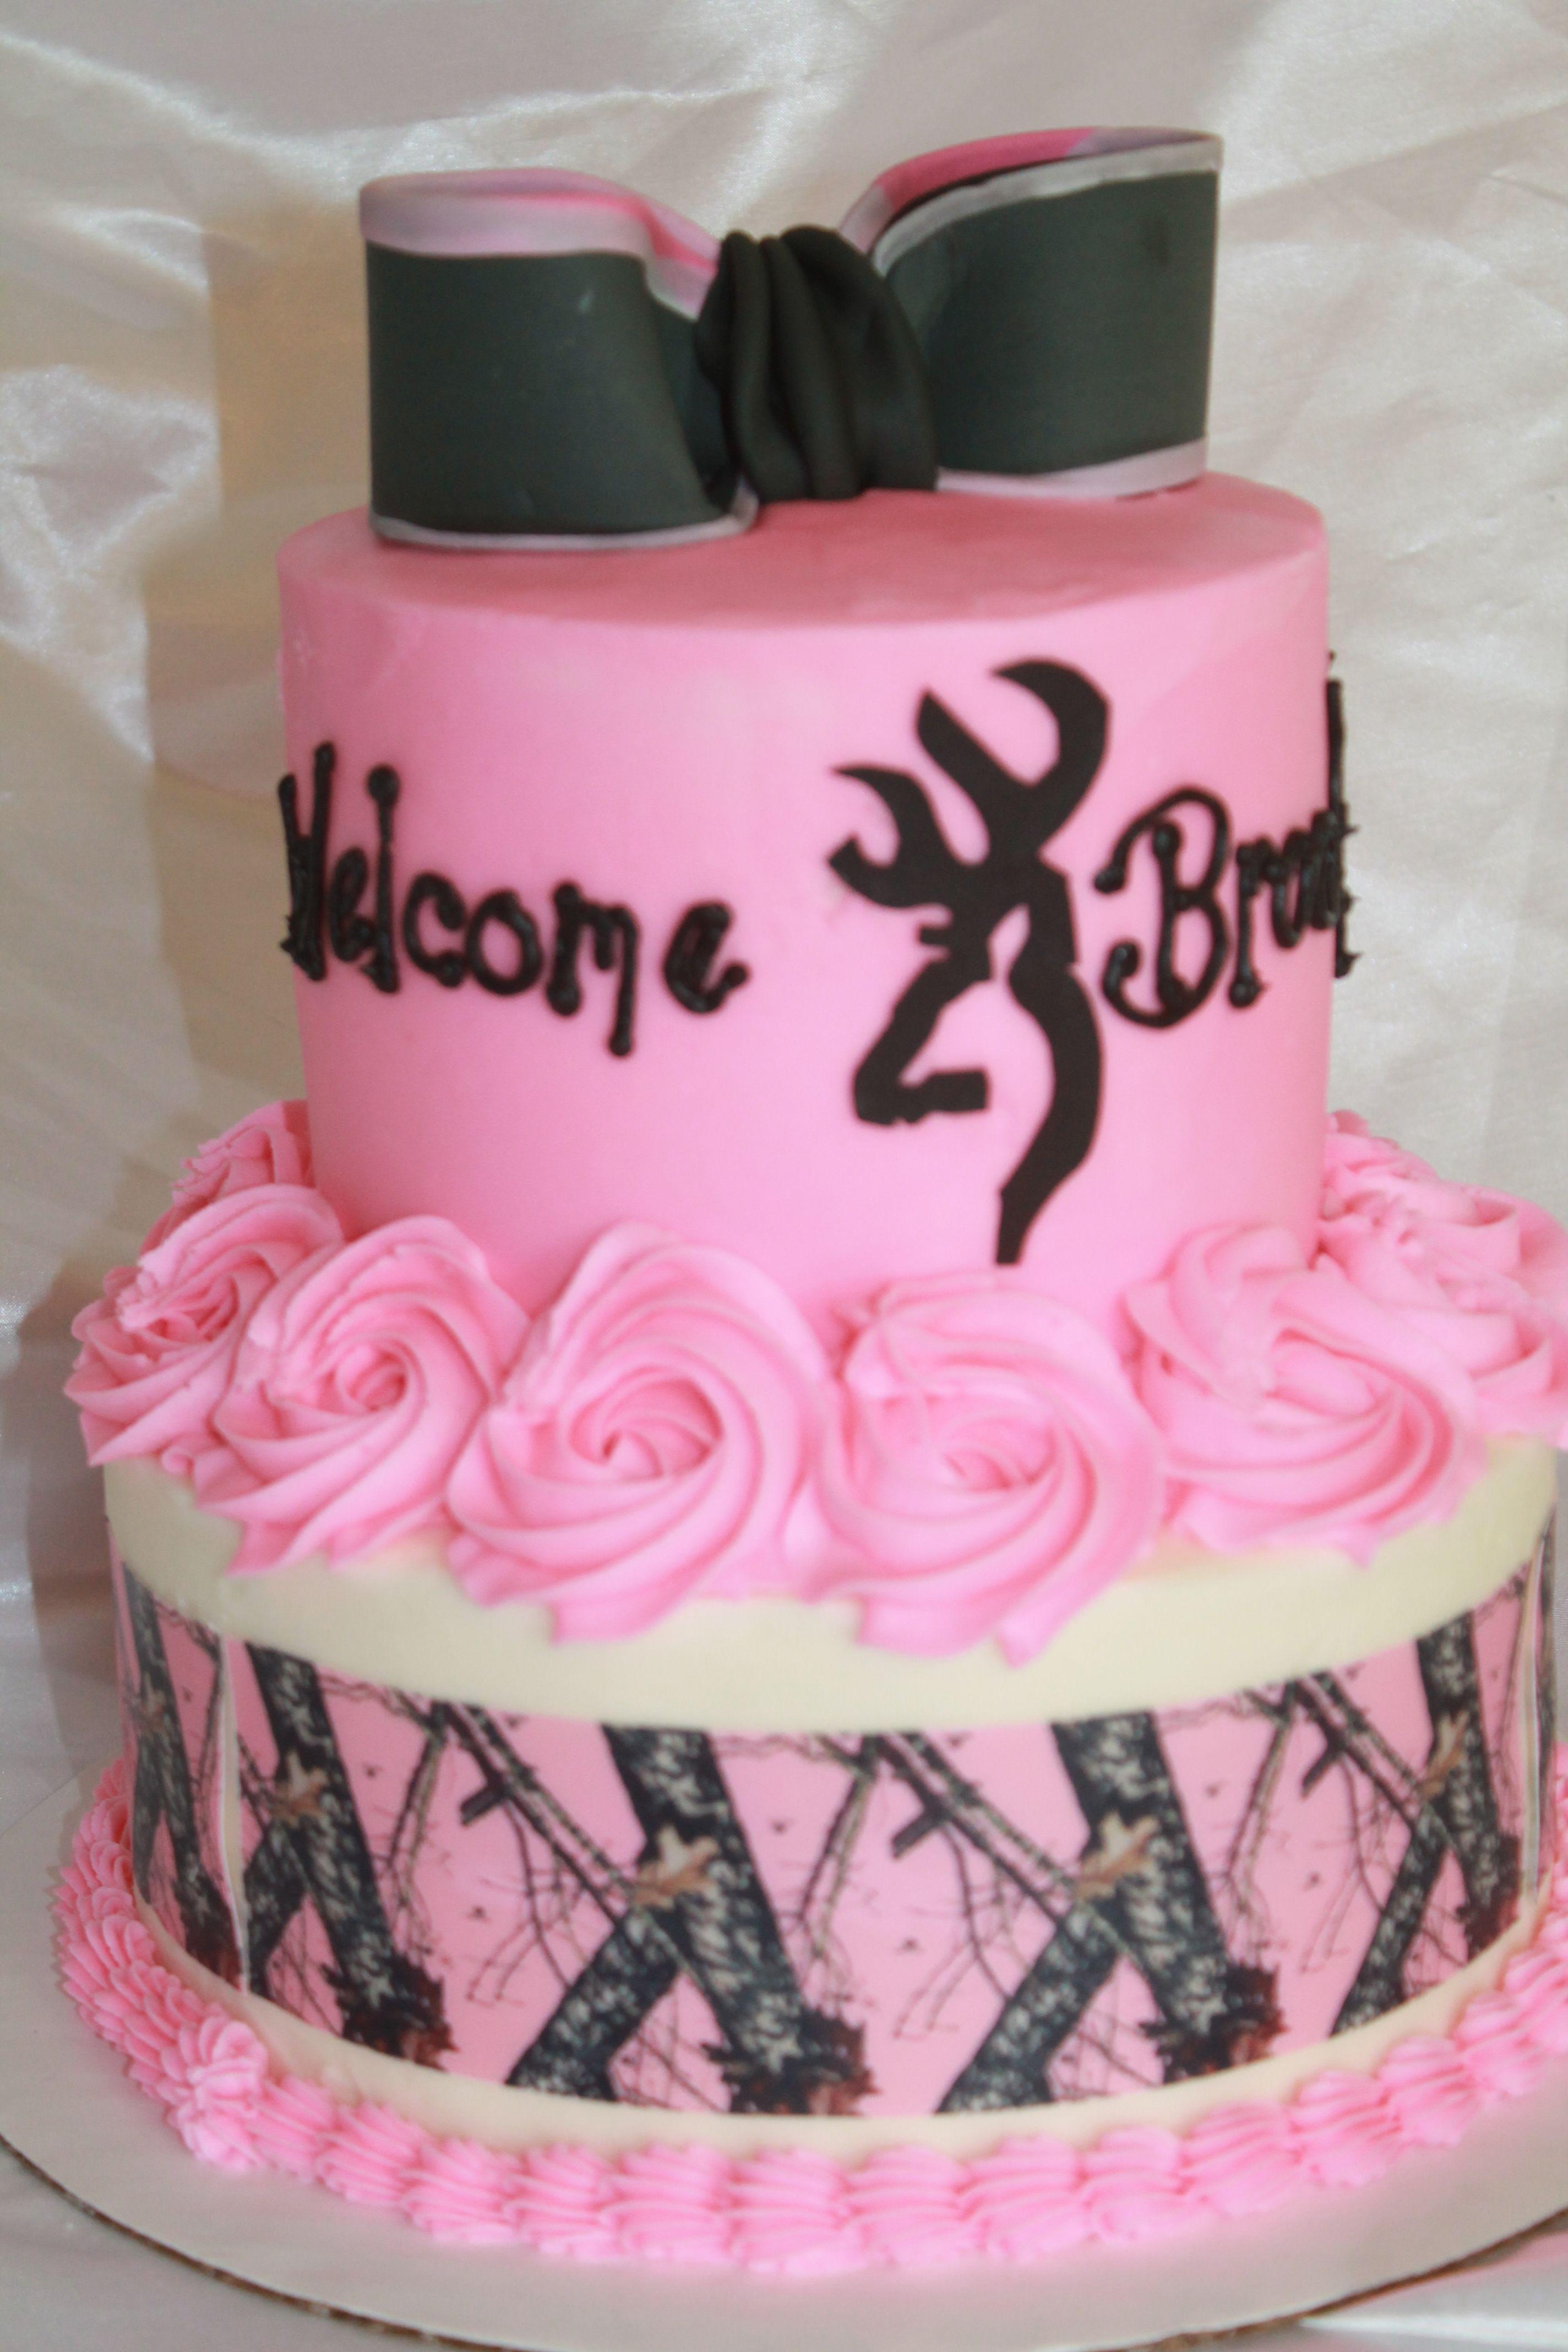 Superb Welcome Baby Girl Camo Cake Camo Birthday Cakes Camo Baby Cake Personalised Birthday Cards Paralily Jamesorg